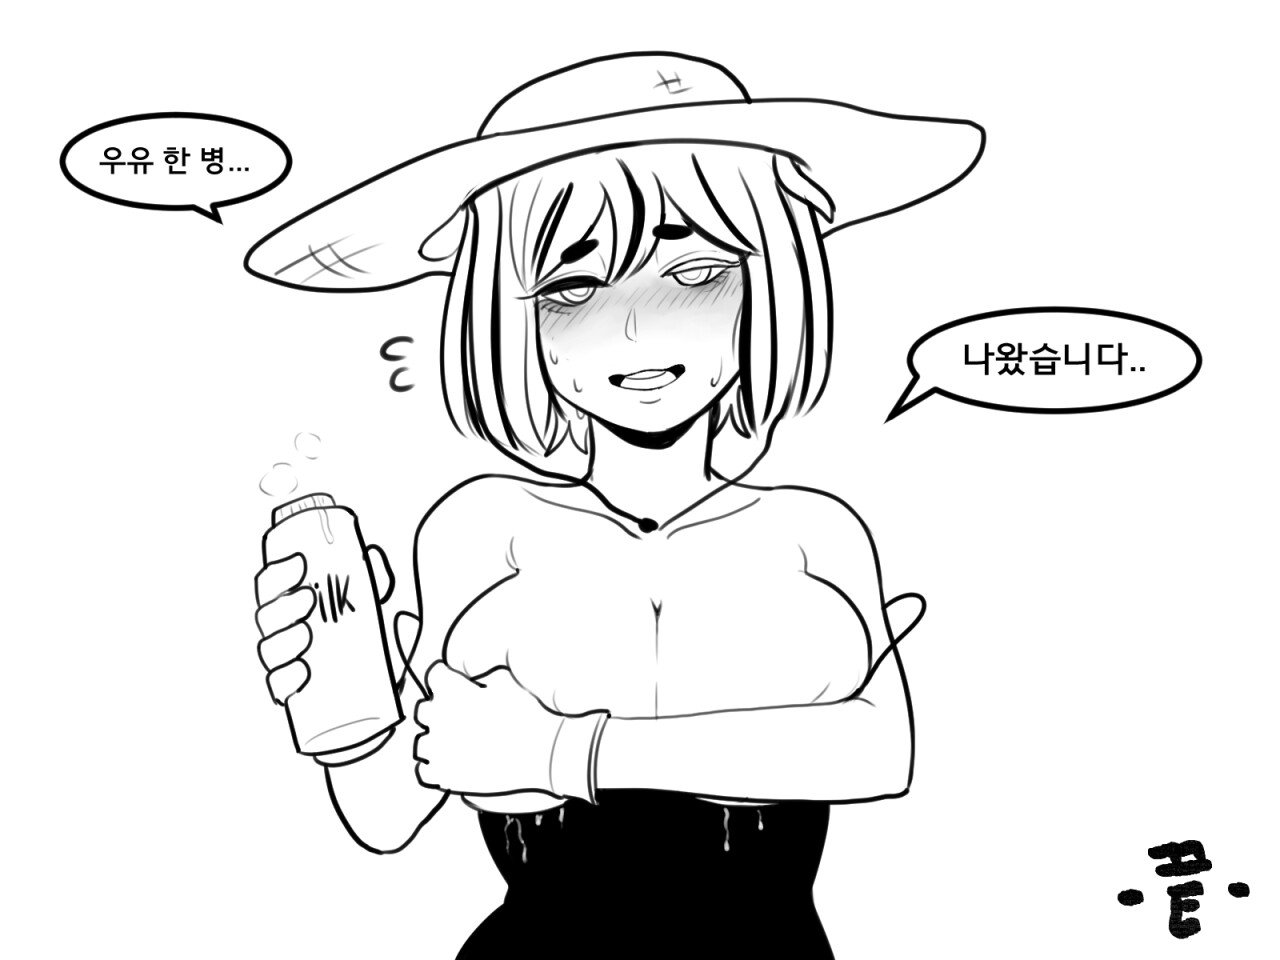 cartoon-20200407-235833-008.jpg ㅇㅎ) 우유 만드는 법.manhwa